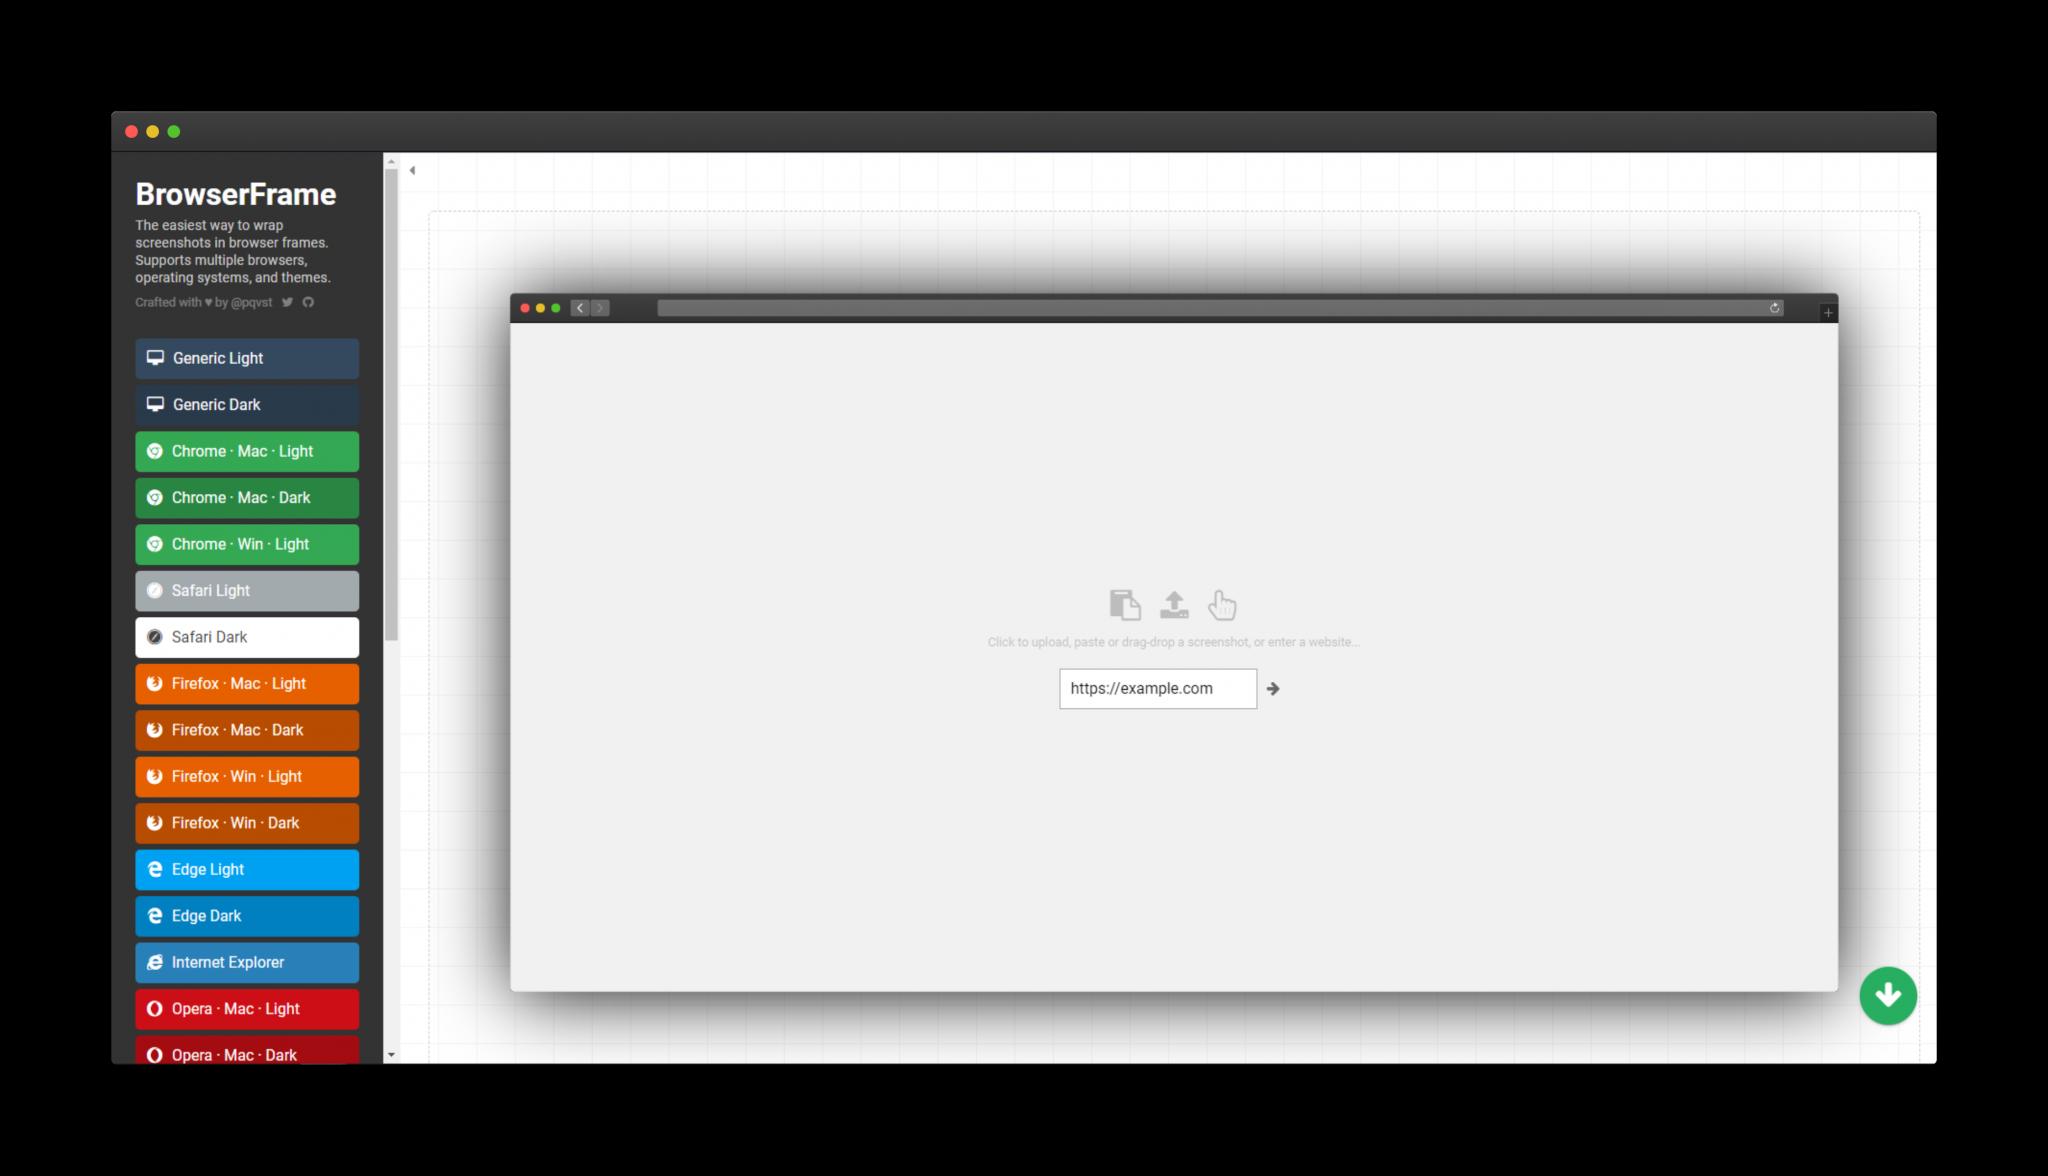 BrowserFrame - 無需任何修圖技術即可為網頁截圖加上瀏覽器外框